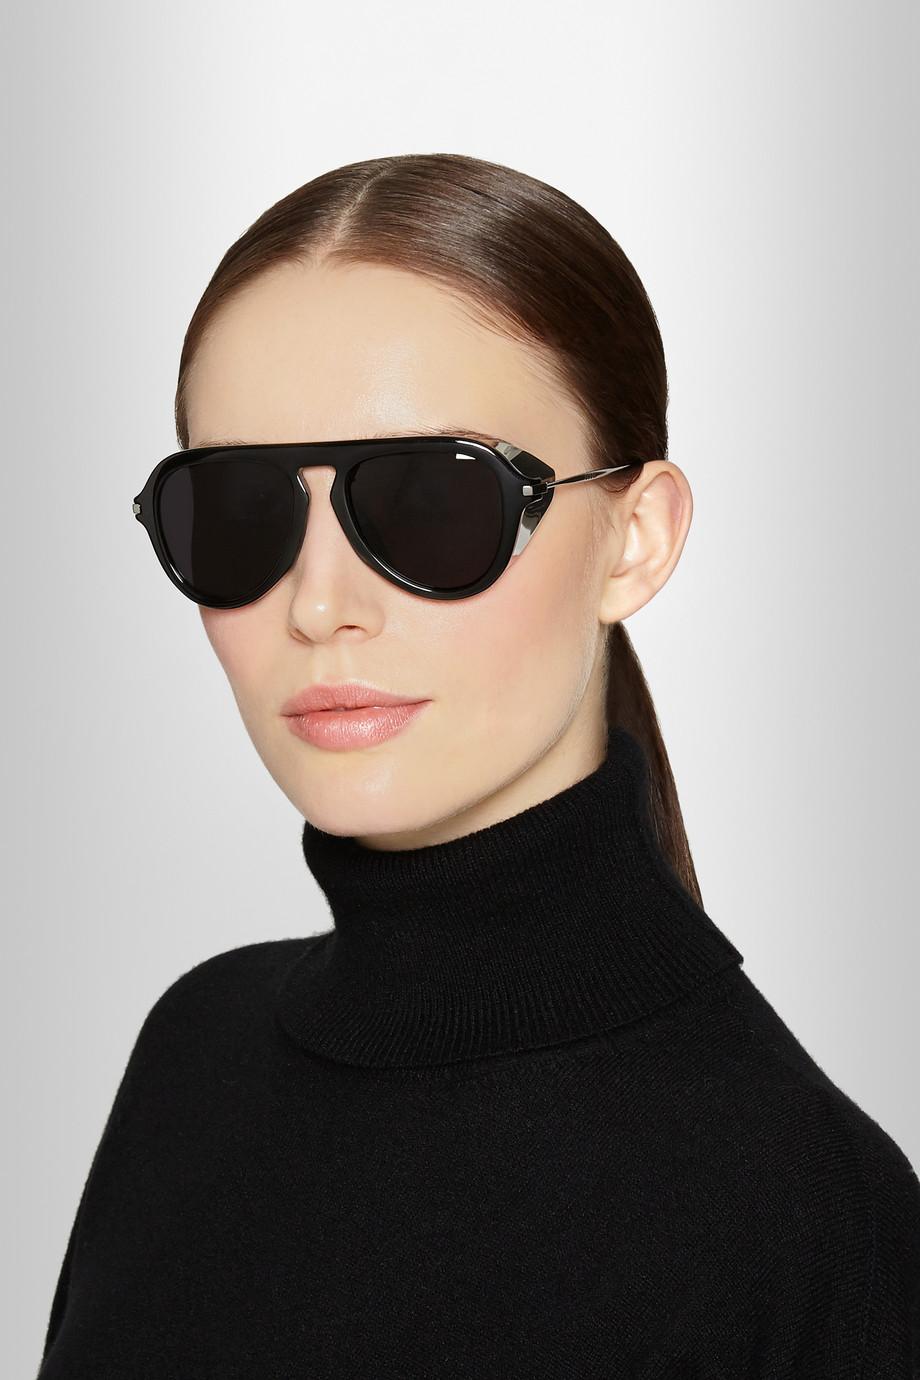 e728dd124 Gucci Vintage Inspired Aviator Sunglasses | Style Me Maude